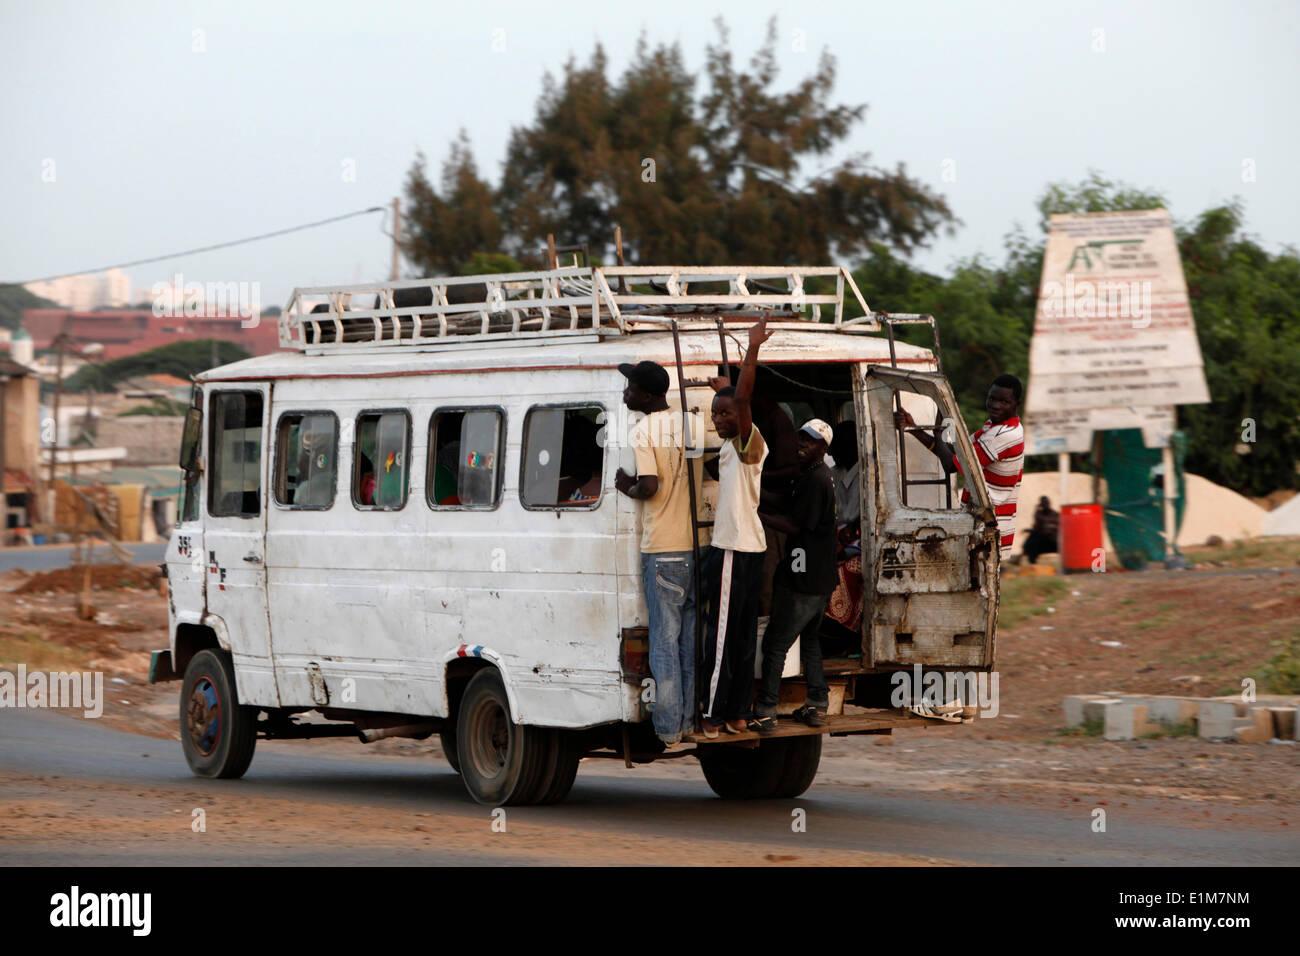 Öffentliche Verkehrsmittel Stockbild